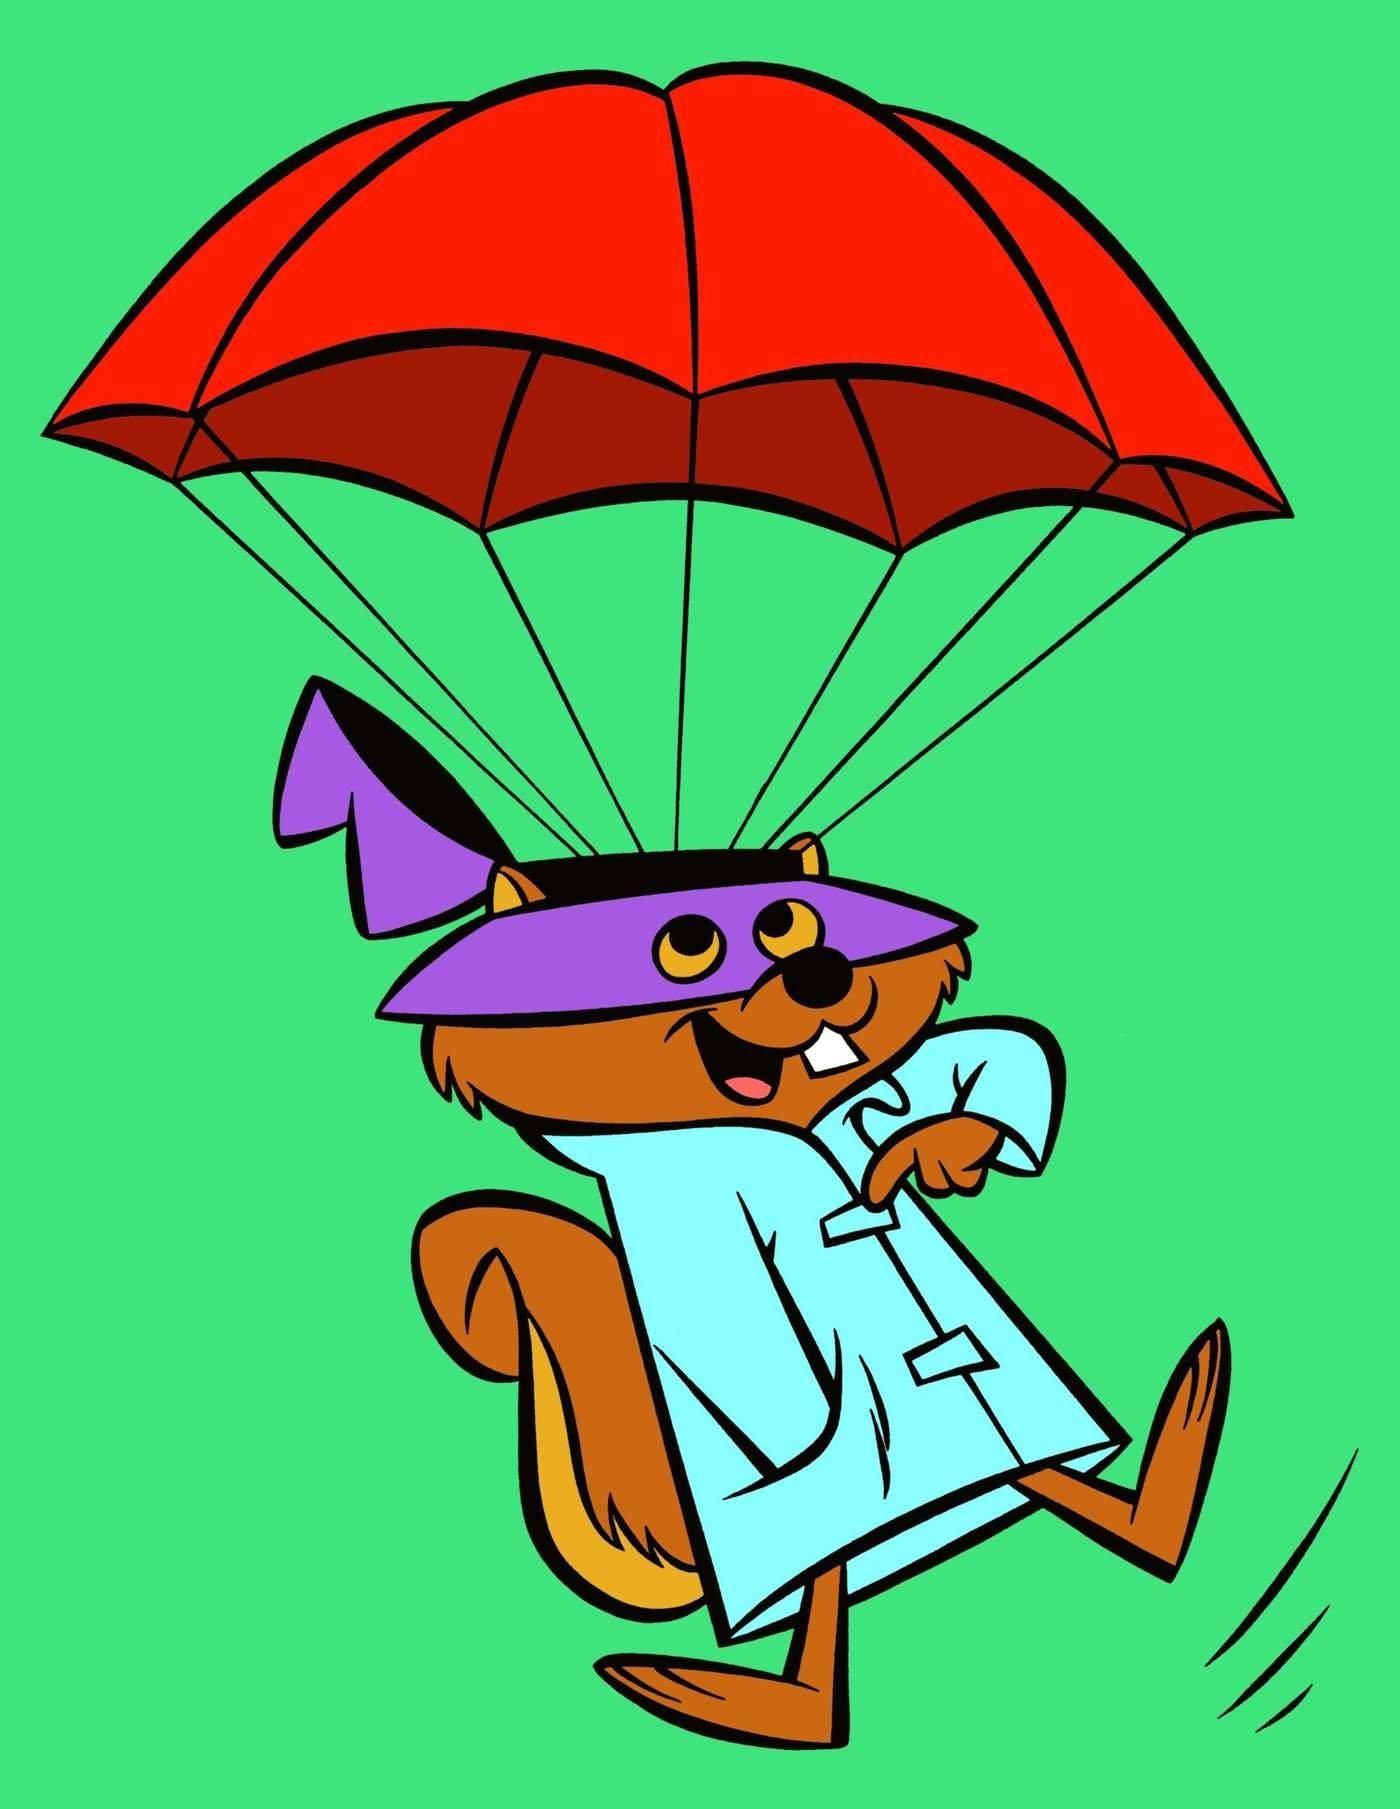 PATRICK OWSLEY CARTOON ART by PATRICK OWSLEY at Coroflot com